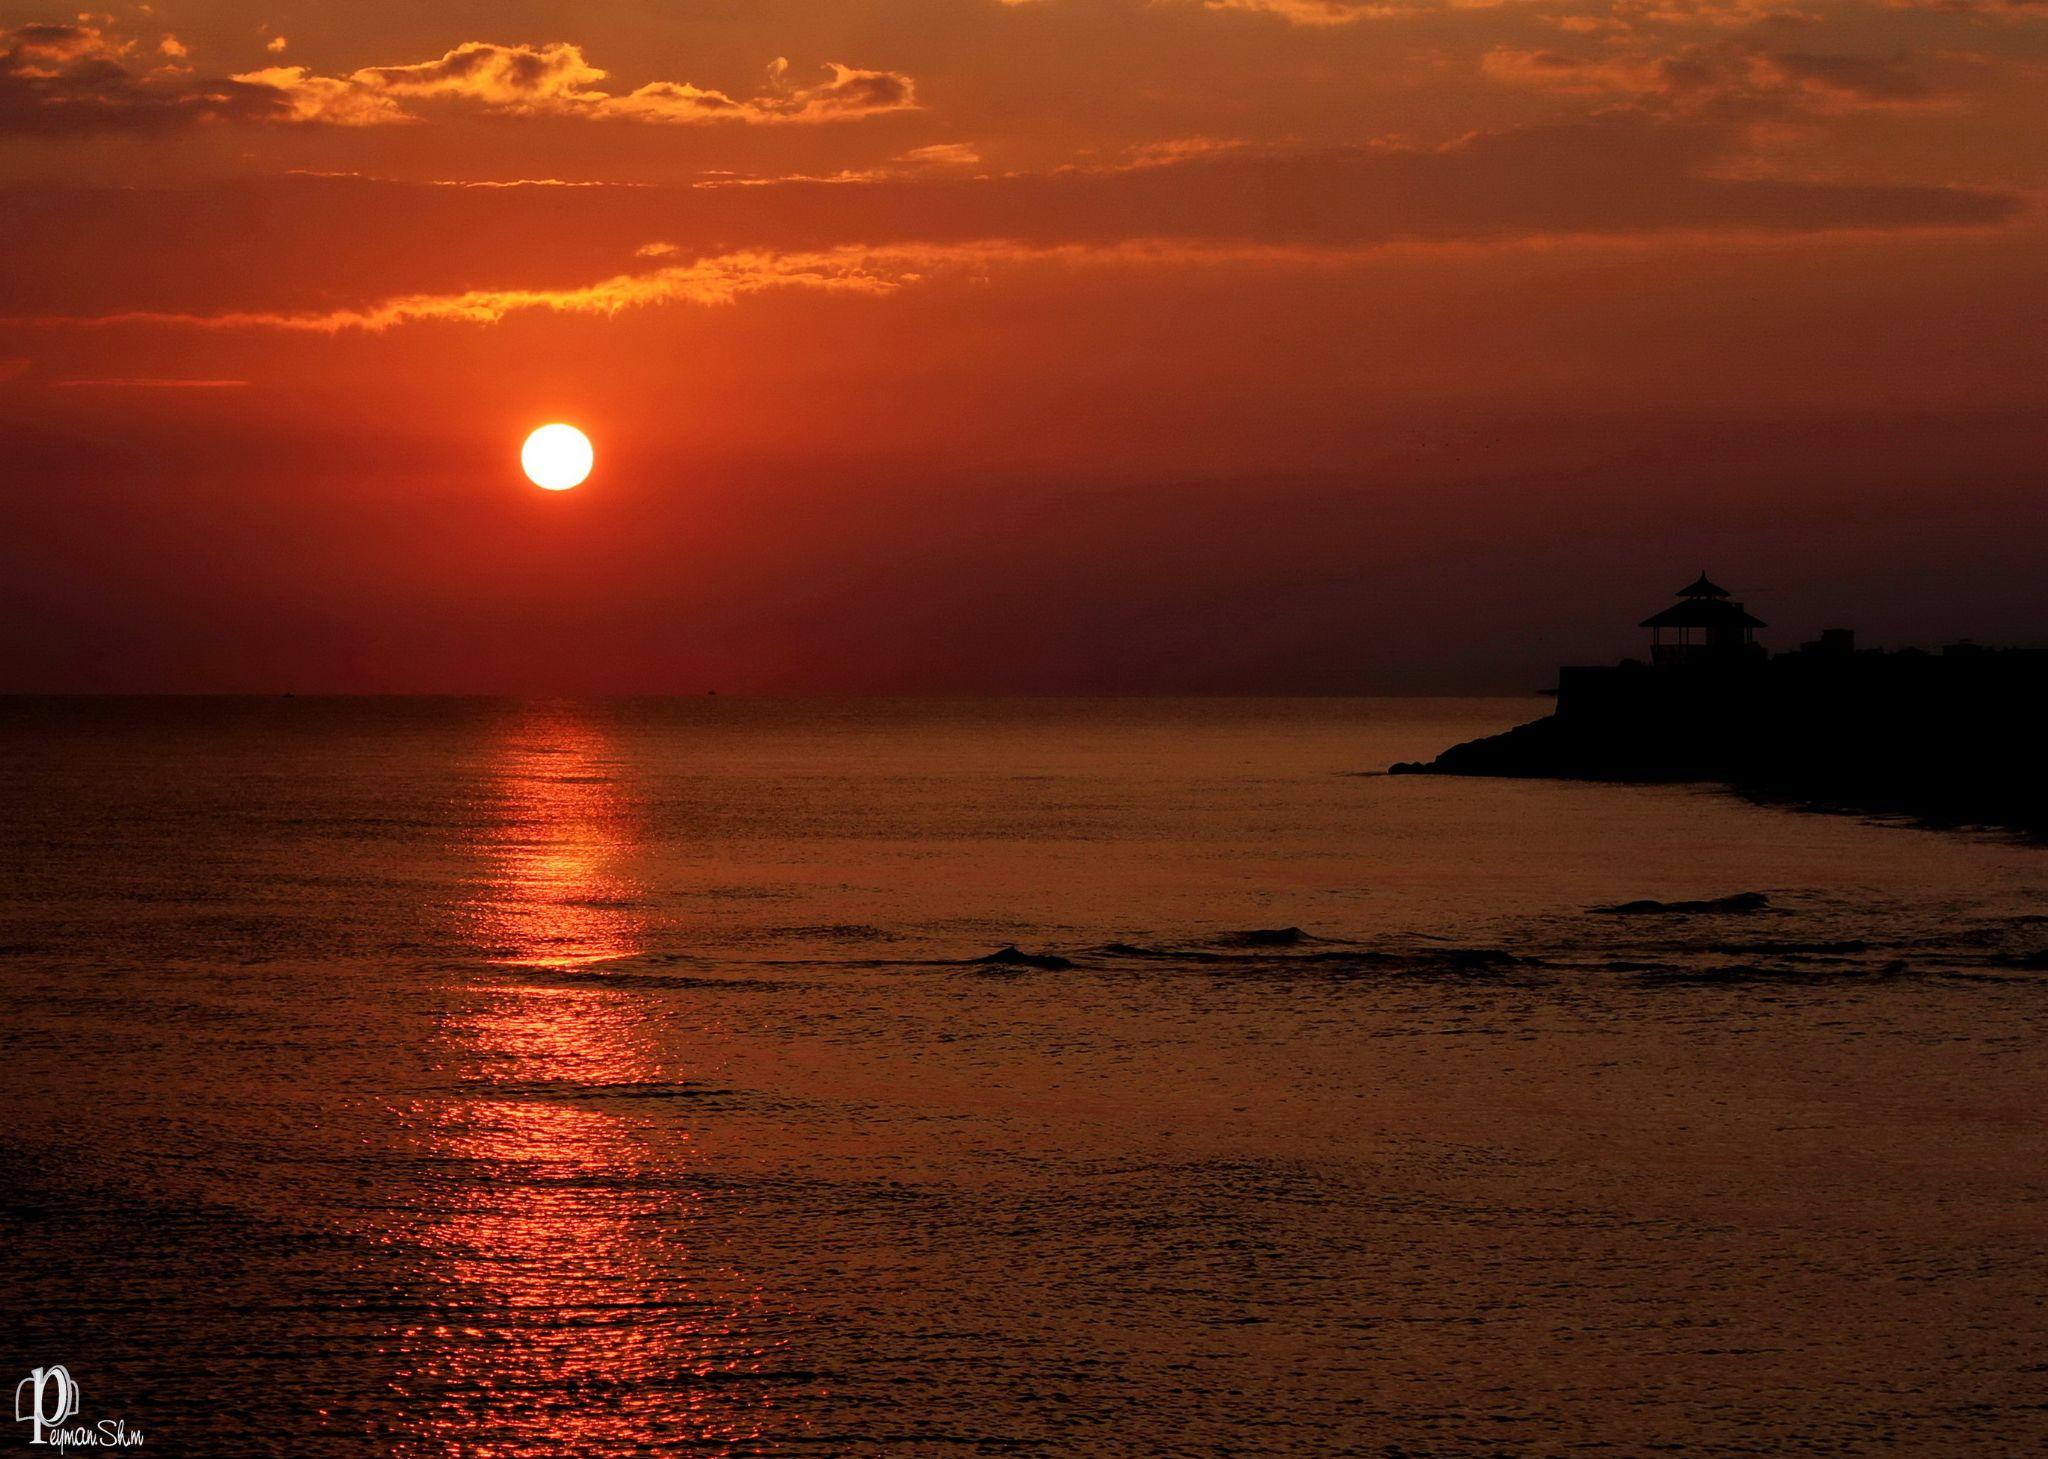 Sunrise by Peyman shm